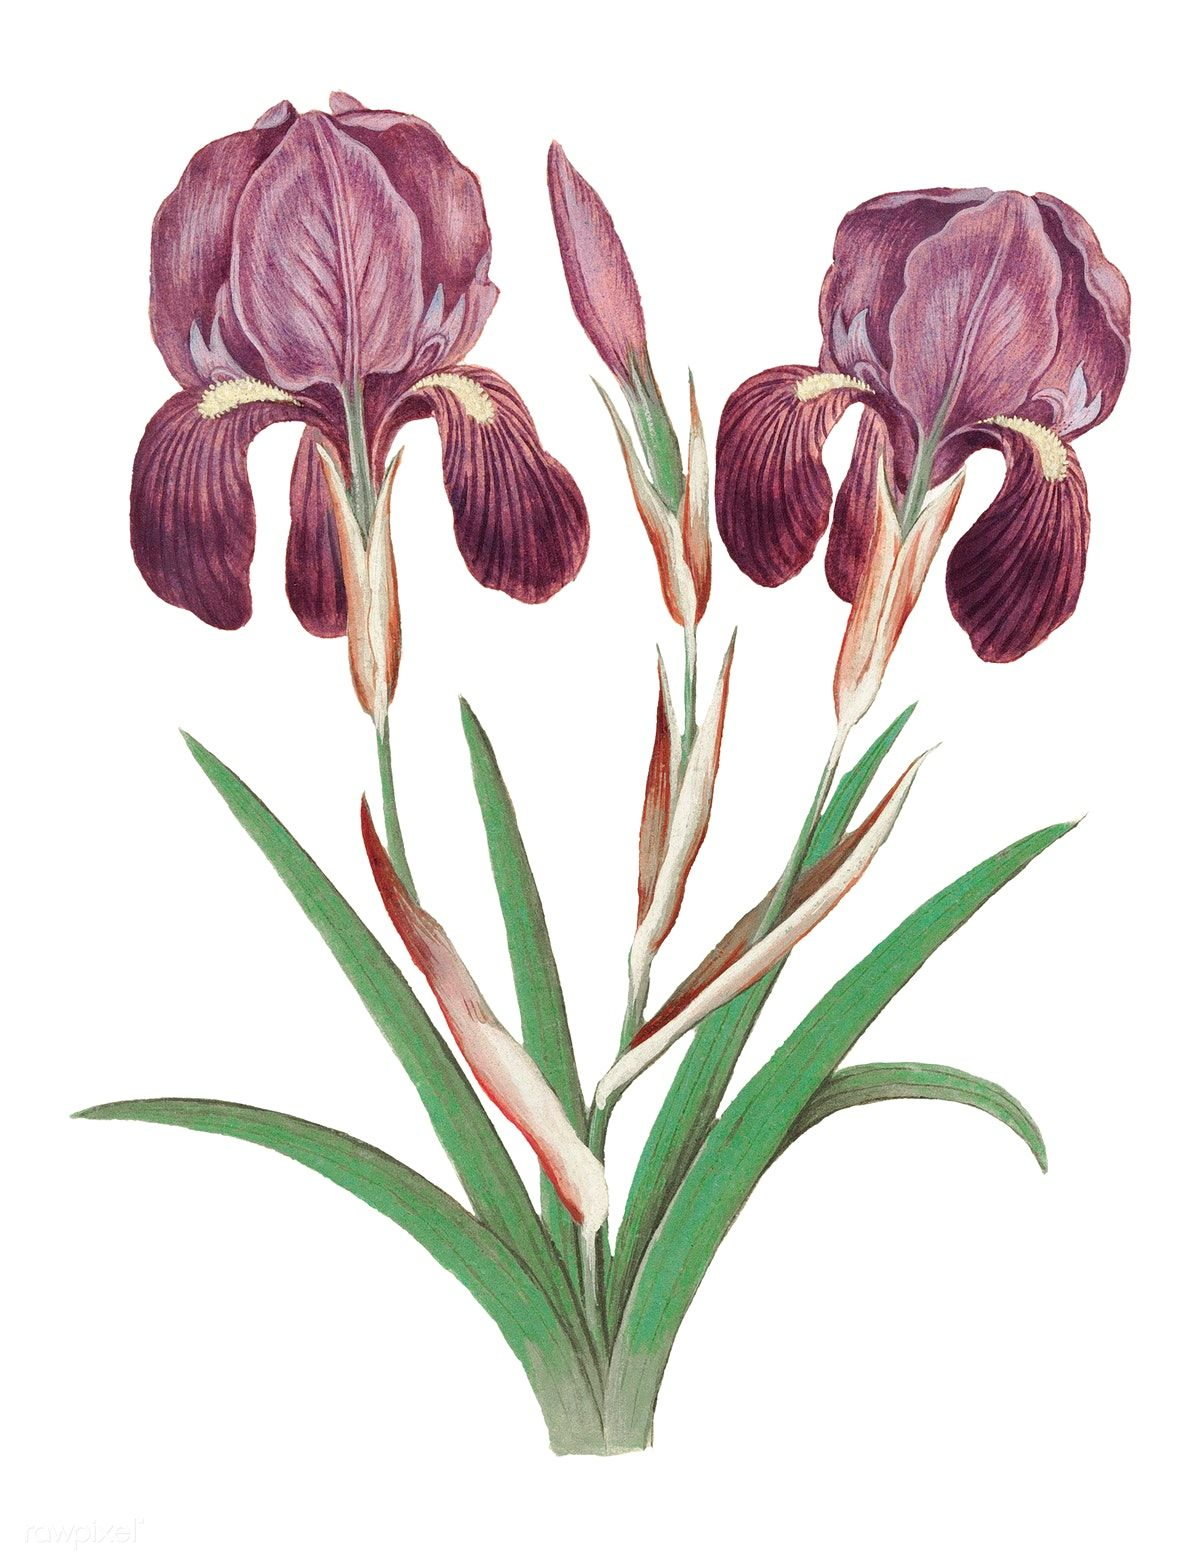 Download Premium Png Of Vintage Purple Iris Flower Illustration 562037 Iris Flowers Peony Illustration Flower Illustration